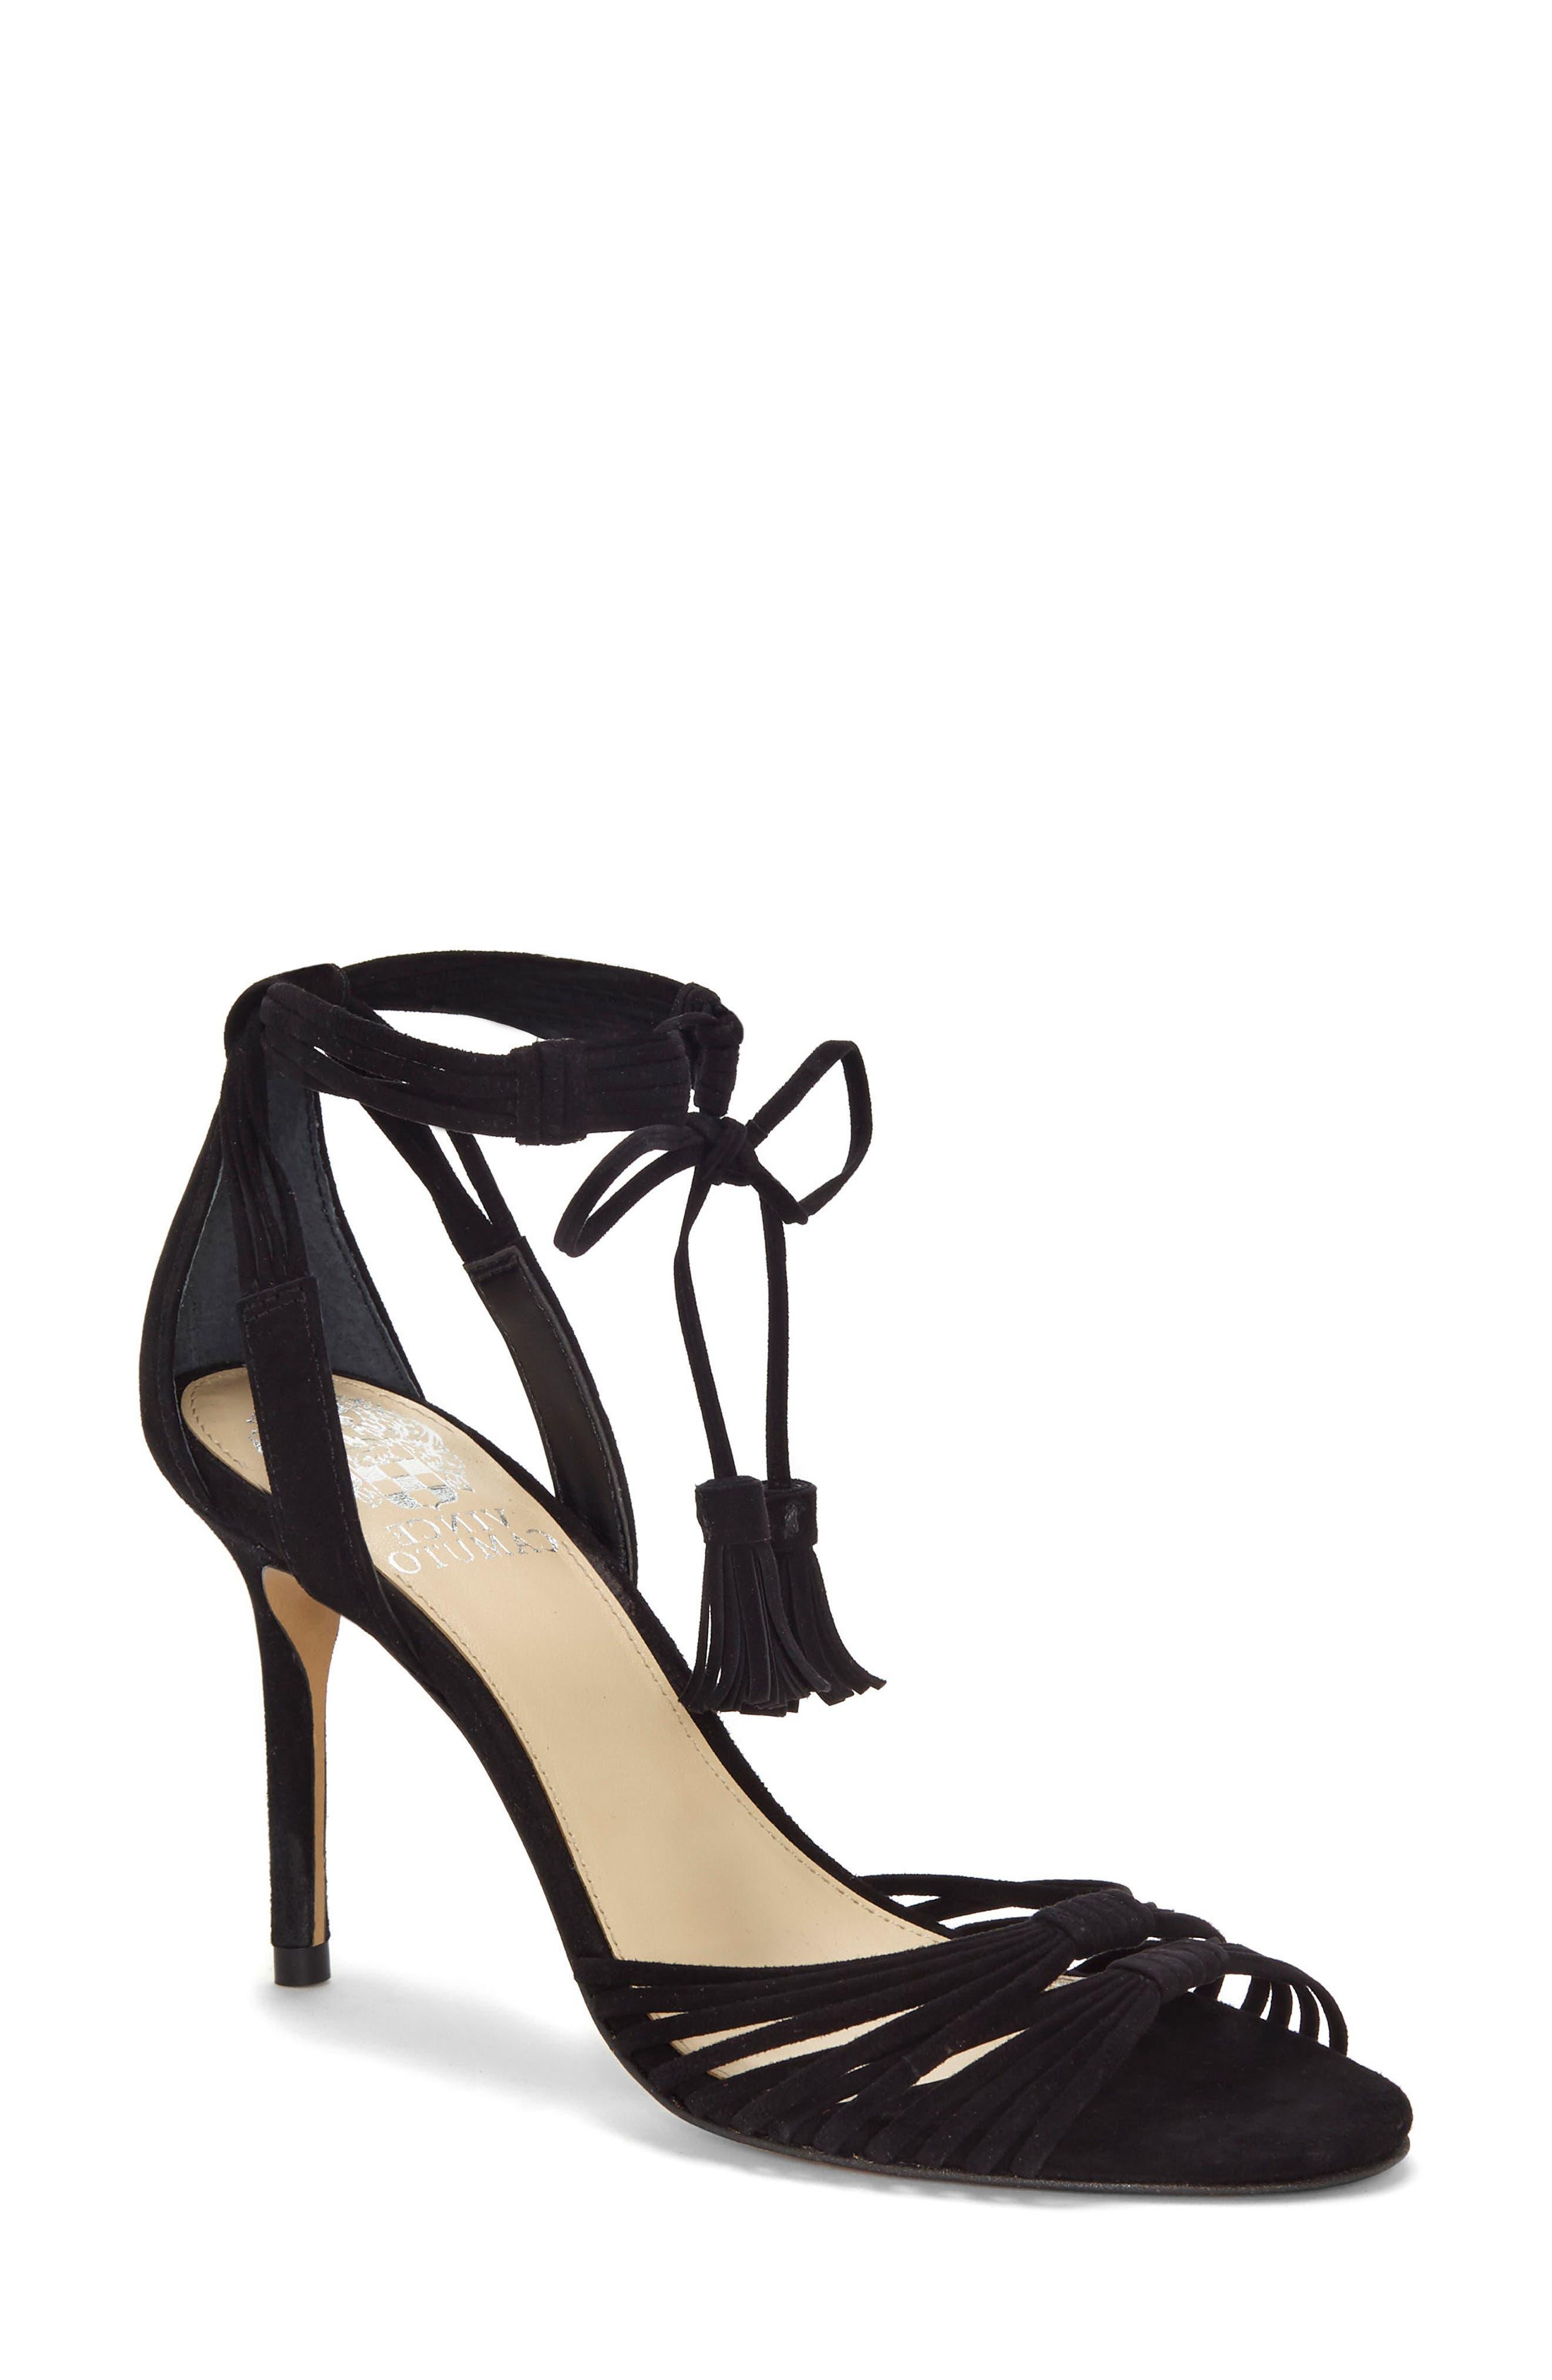 Alternate Image 1 Selected - Vince Camuto Stellima Tassel Sandal (Women)